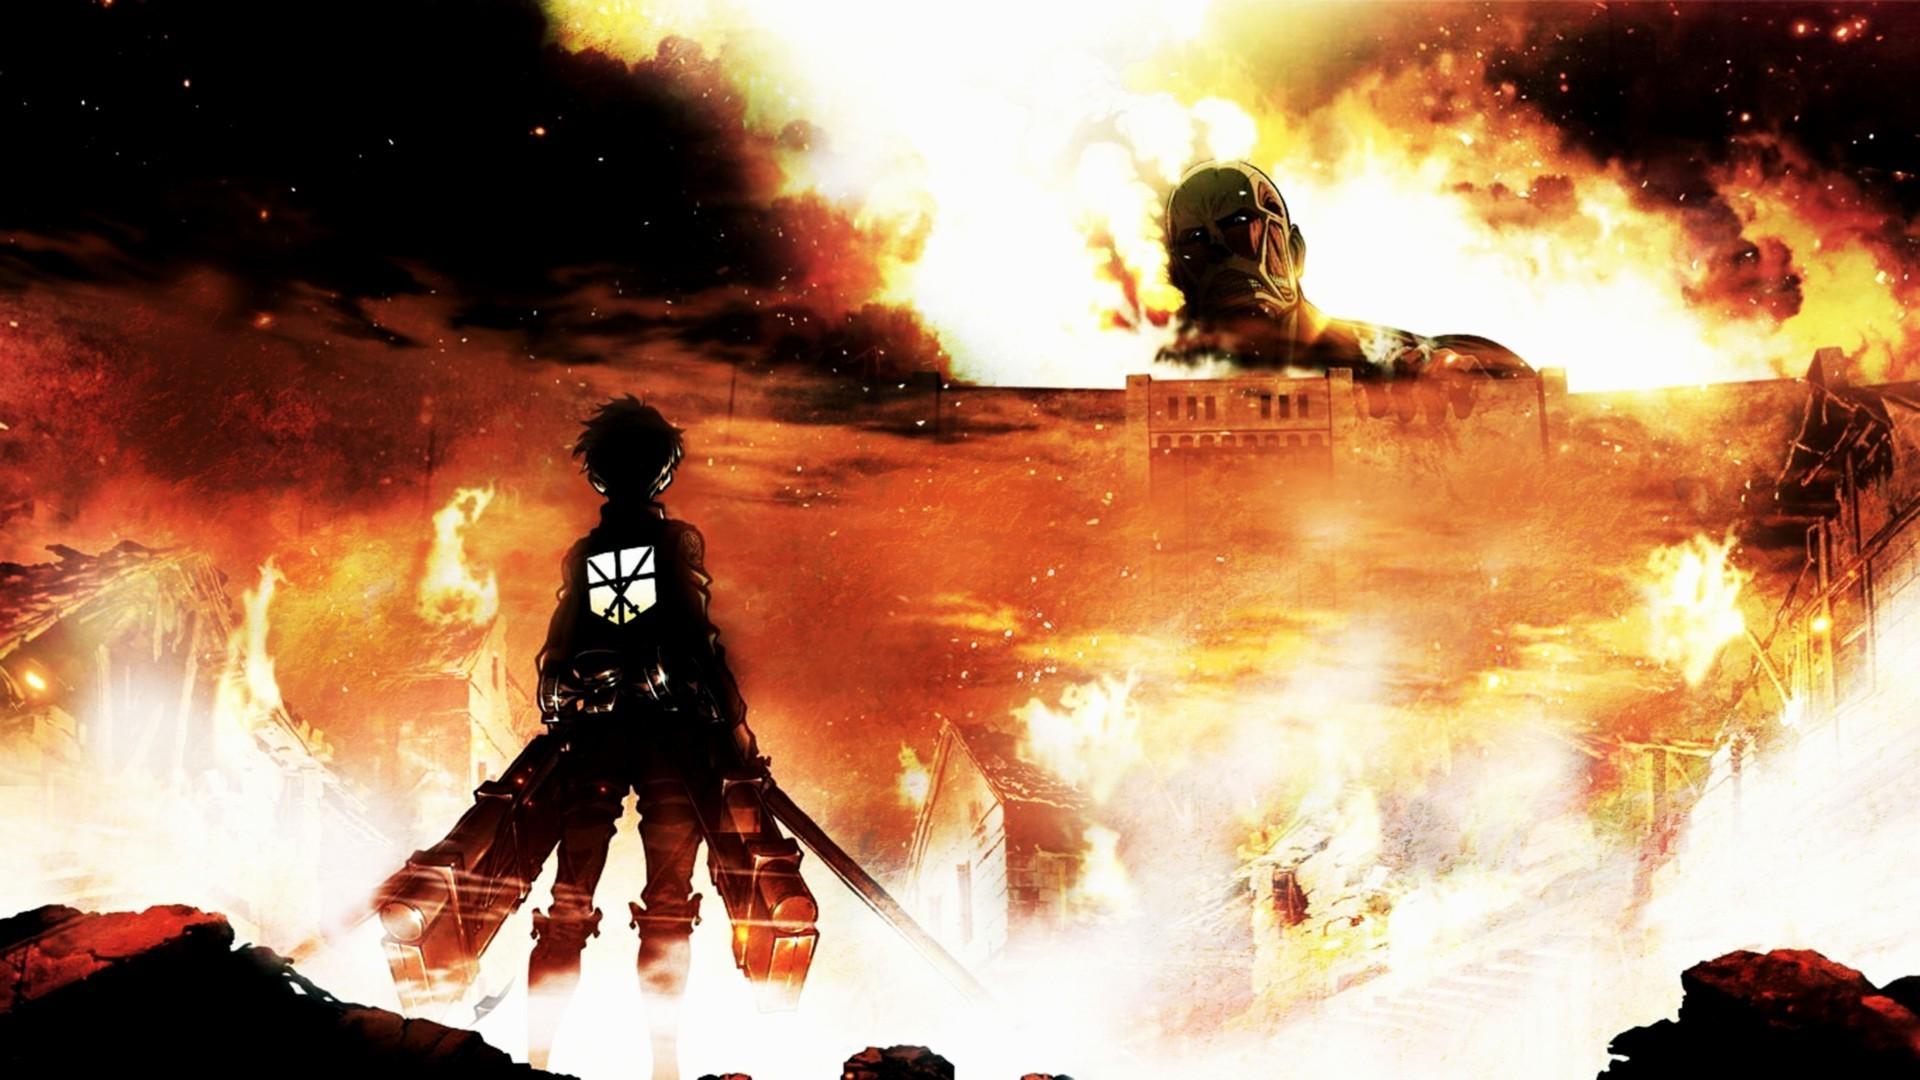 Anime Wallpaper 4k Attack On Titan Anime Wallpapers